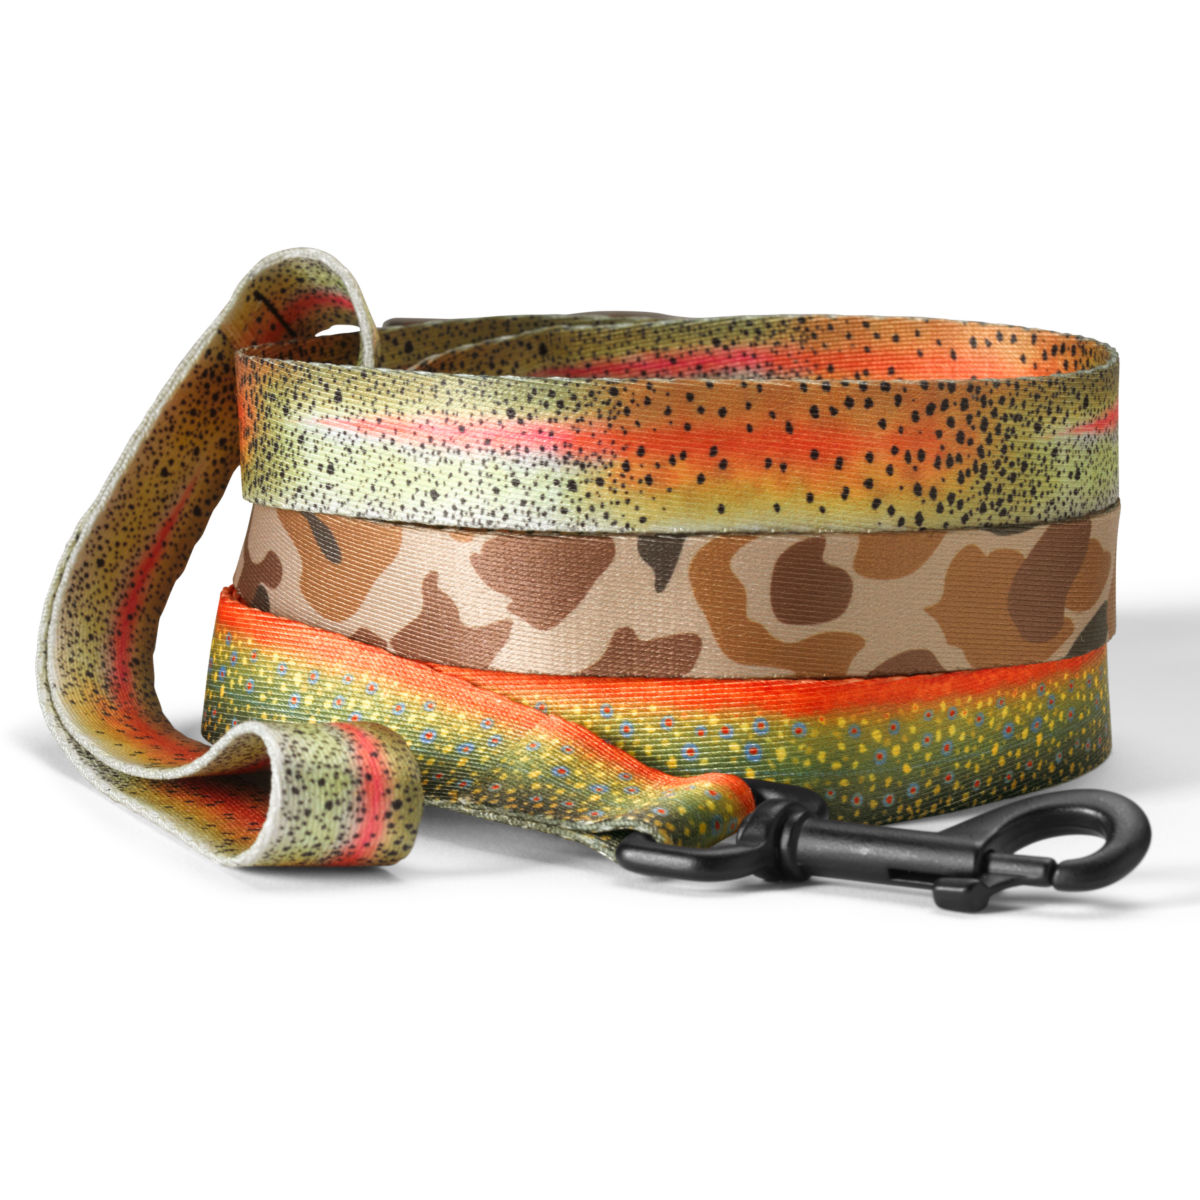 Trout & Camo Print Dog Leash - image number 0